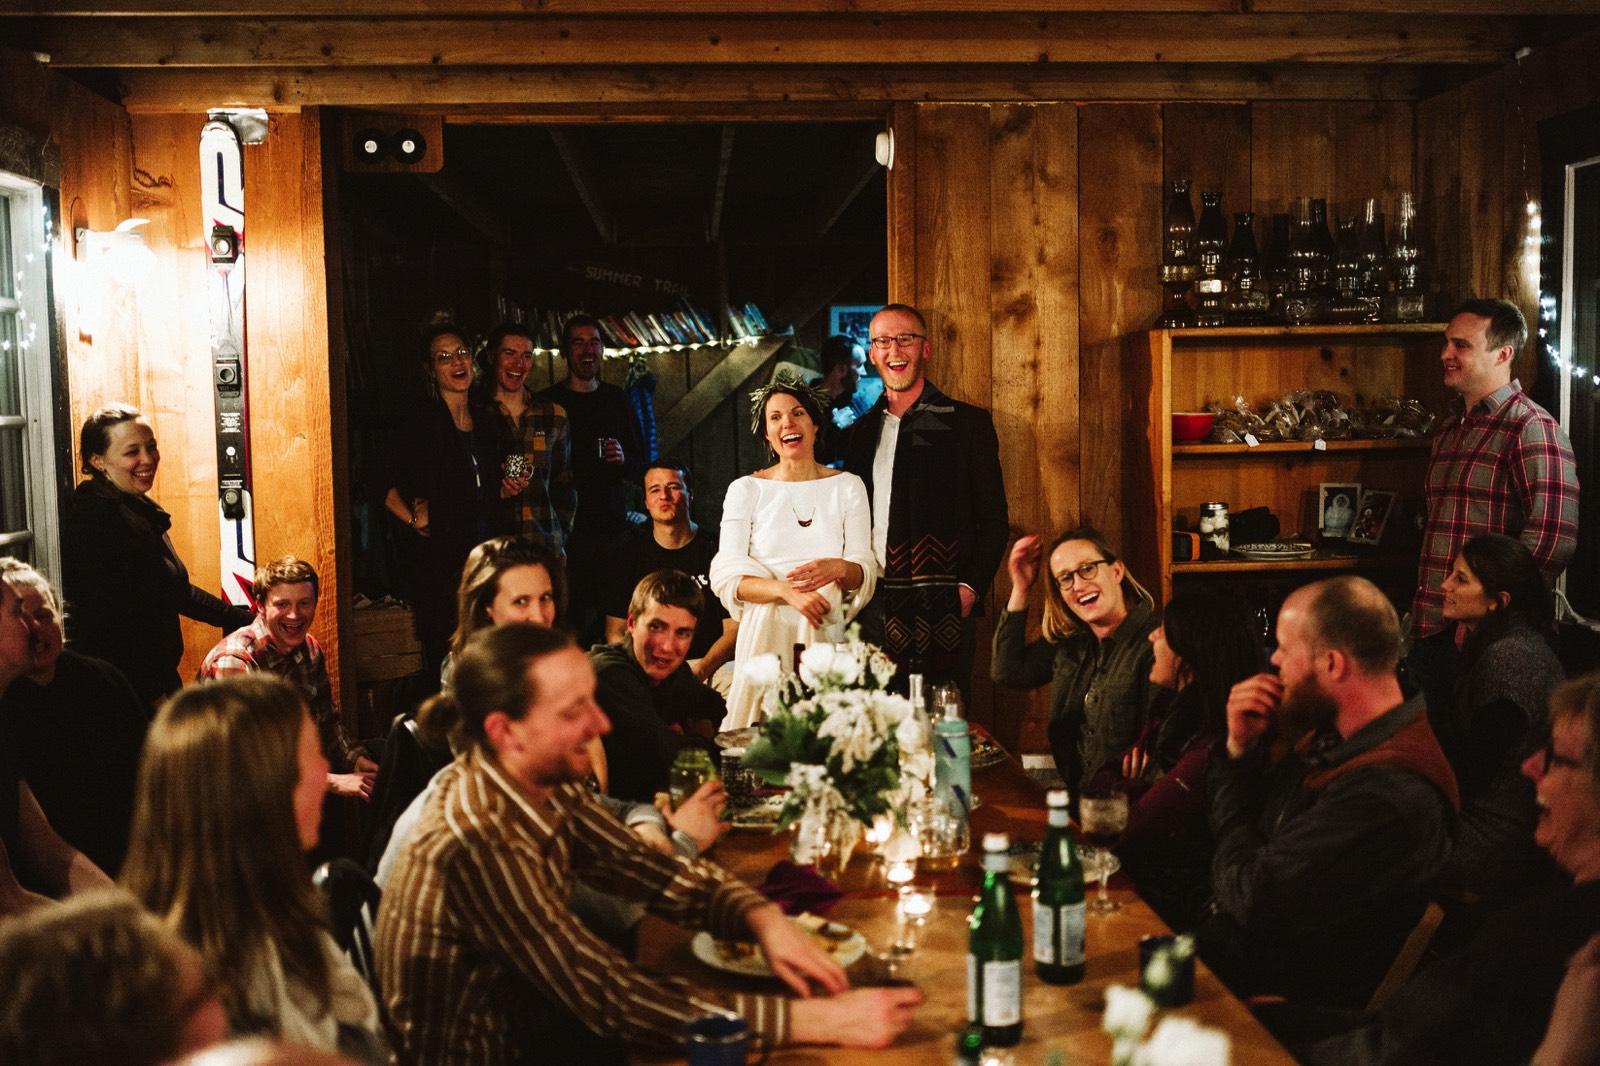 alpine-lakes-high-camp-winter-wedding-87 ALPINE LAKES HIGH CAMP WEDDING